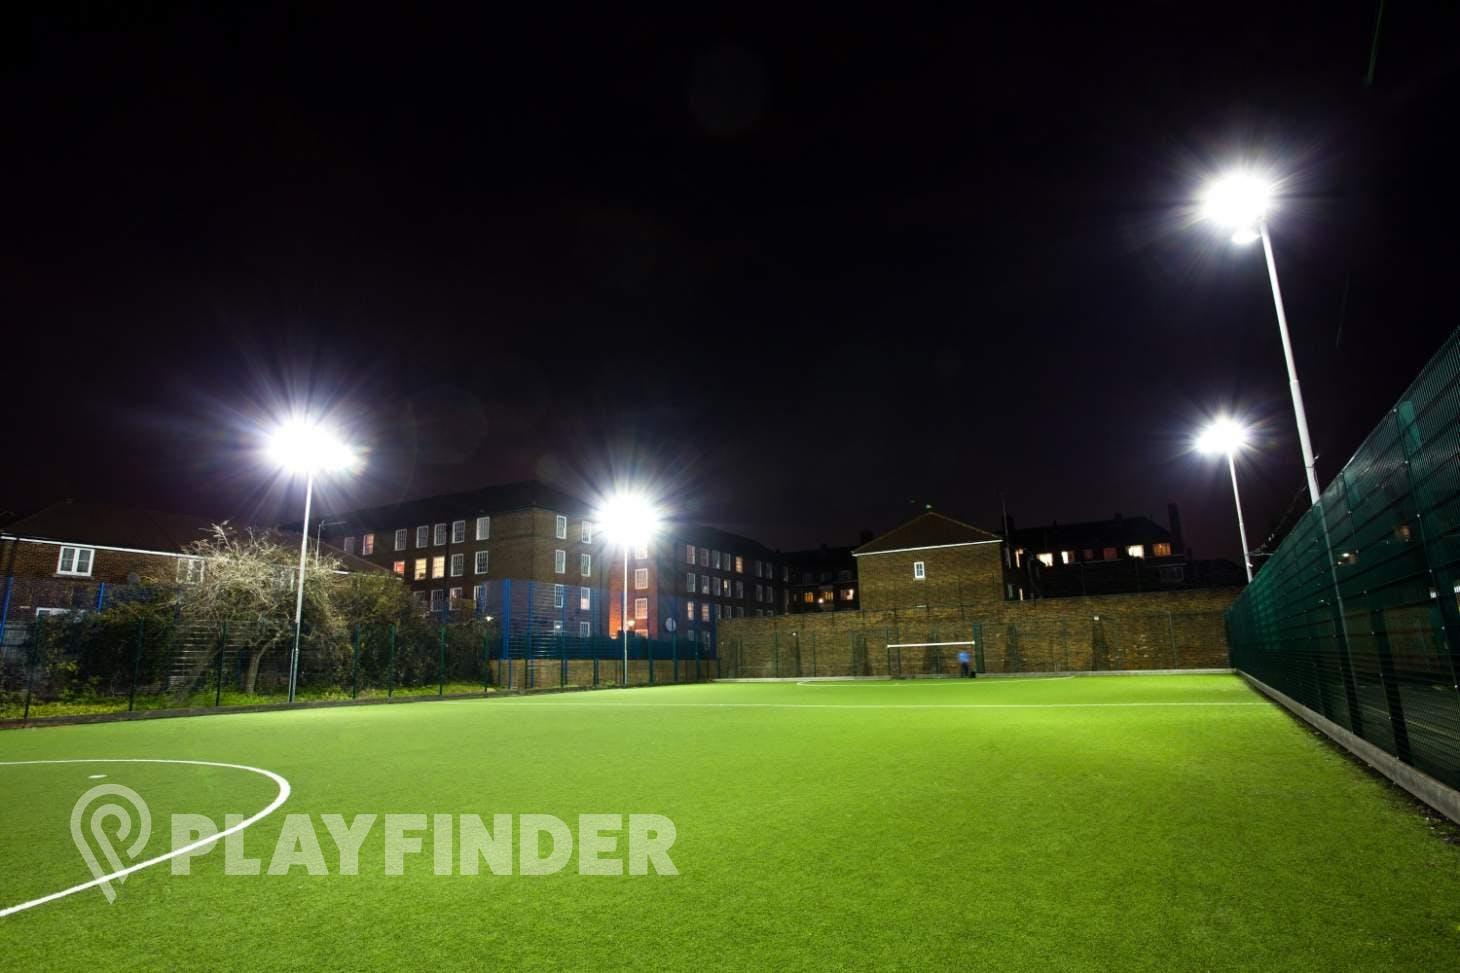 Phoenix Academy 7 a side | 3G Astroturf football pitch